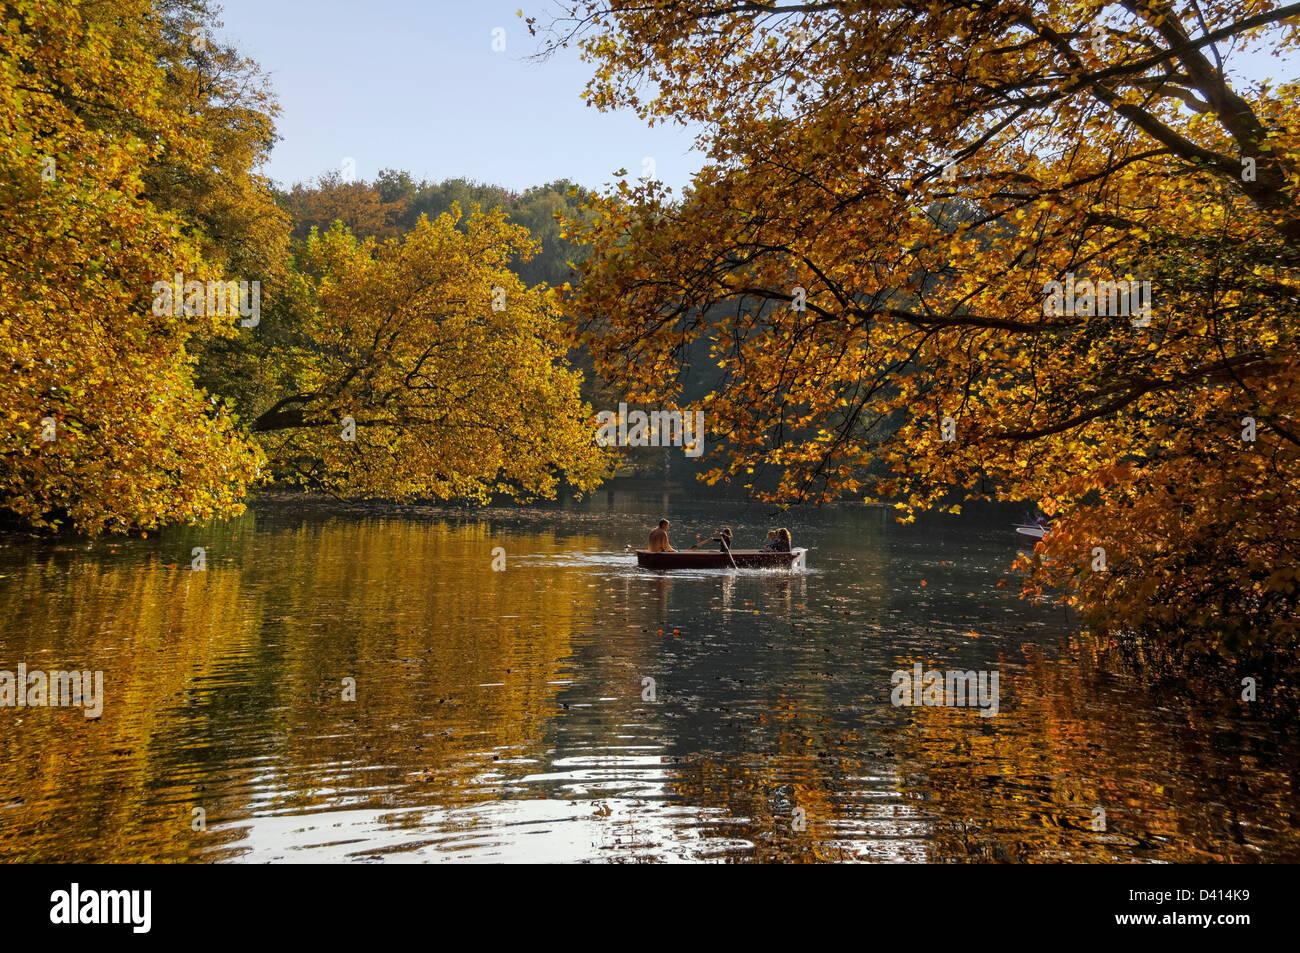 Lake in Tiergarten in autumn, Berlin Center Berlin, Germany - Stock Image